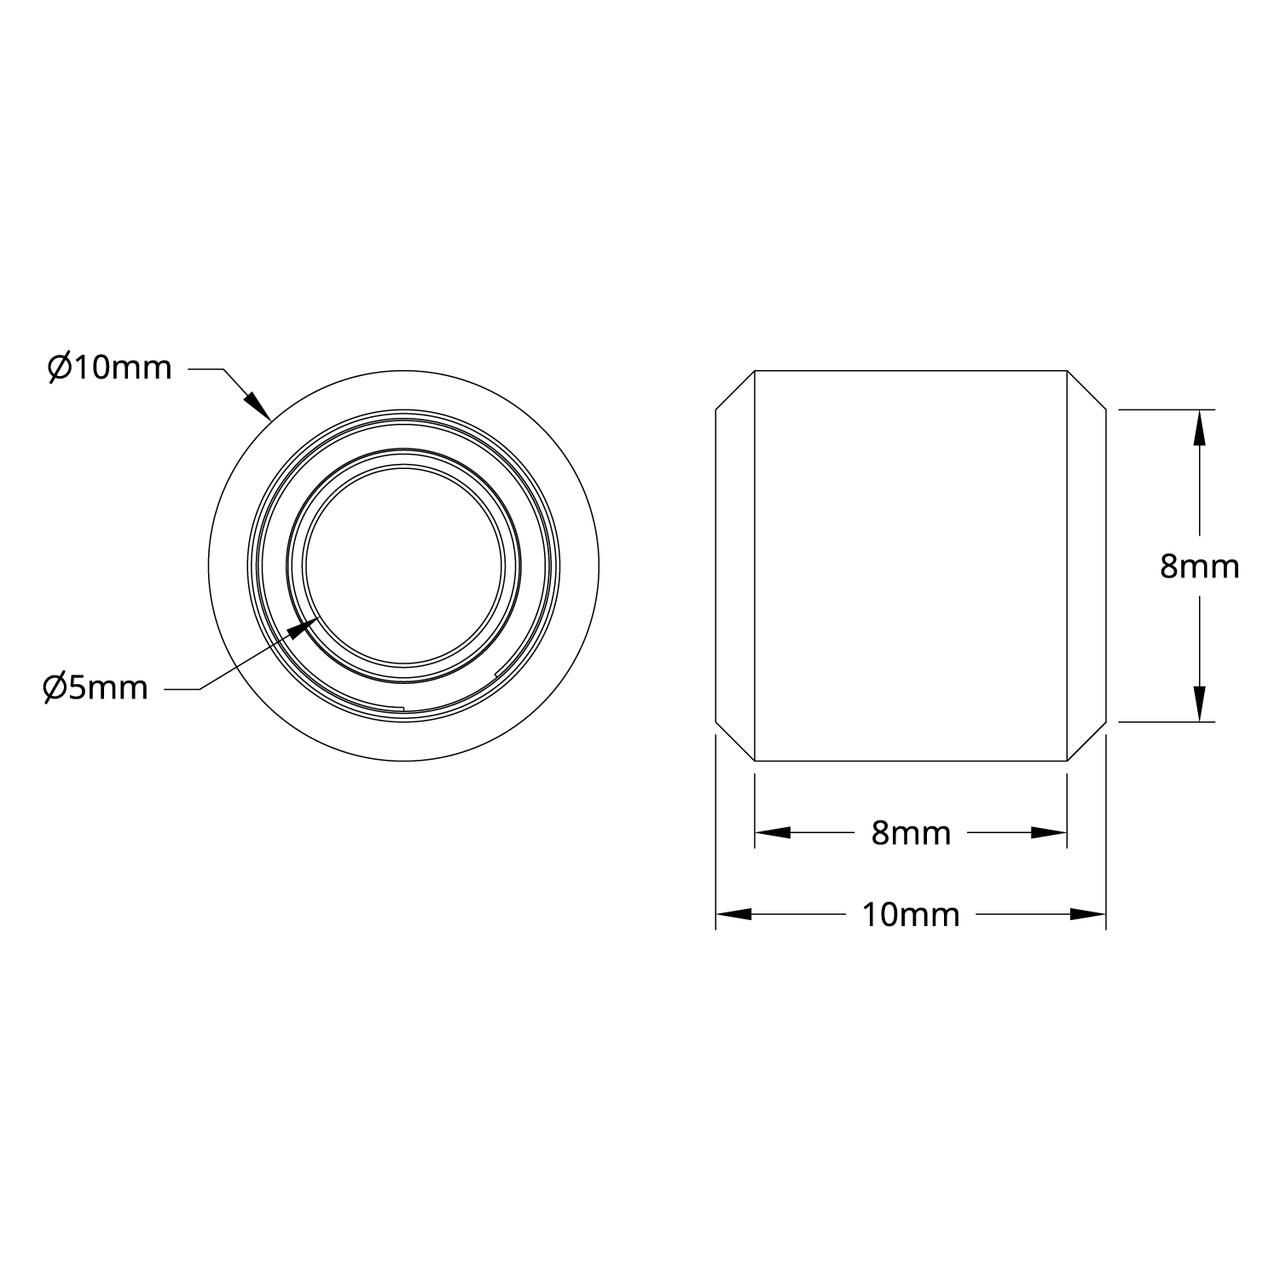 10mm 3600 0005 1010 schematic [ 1280 x 1280 Pixel ]